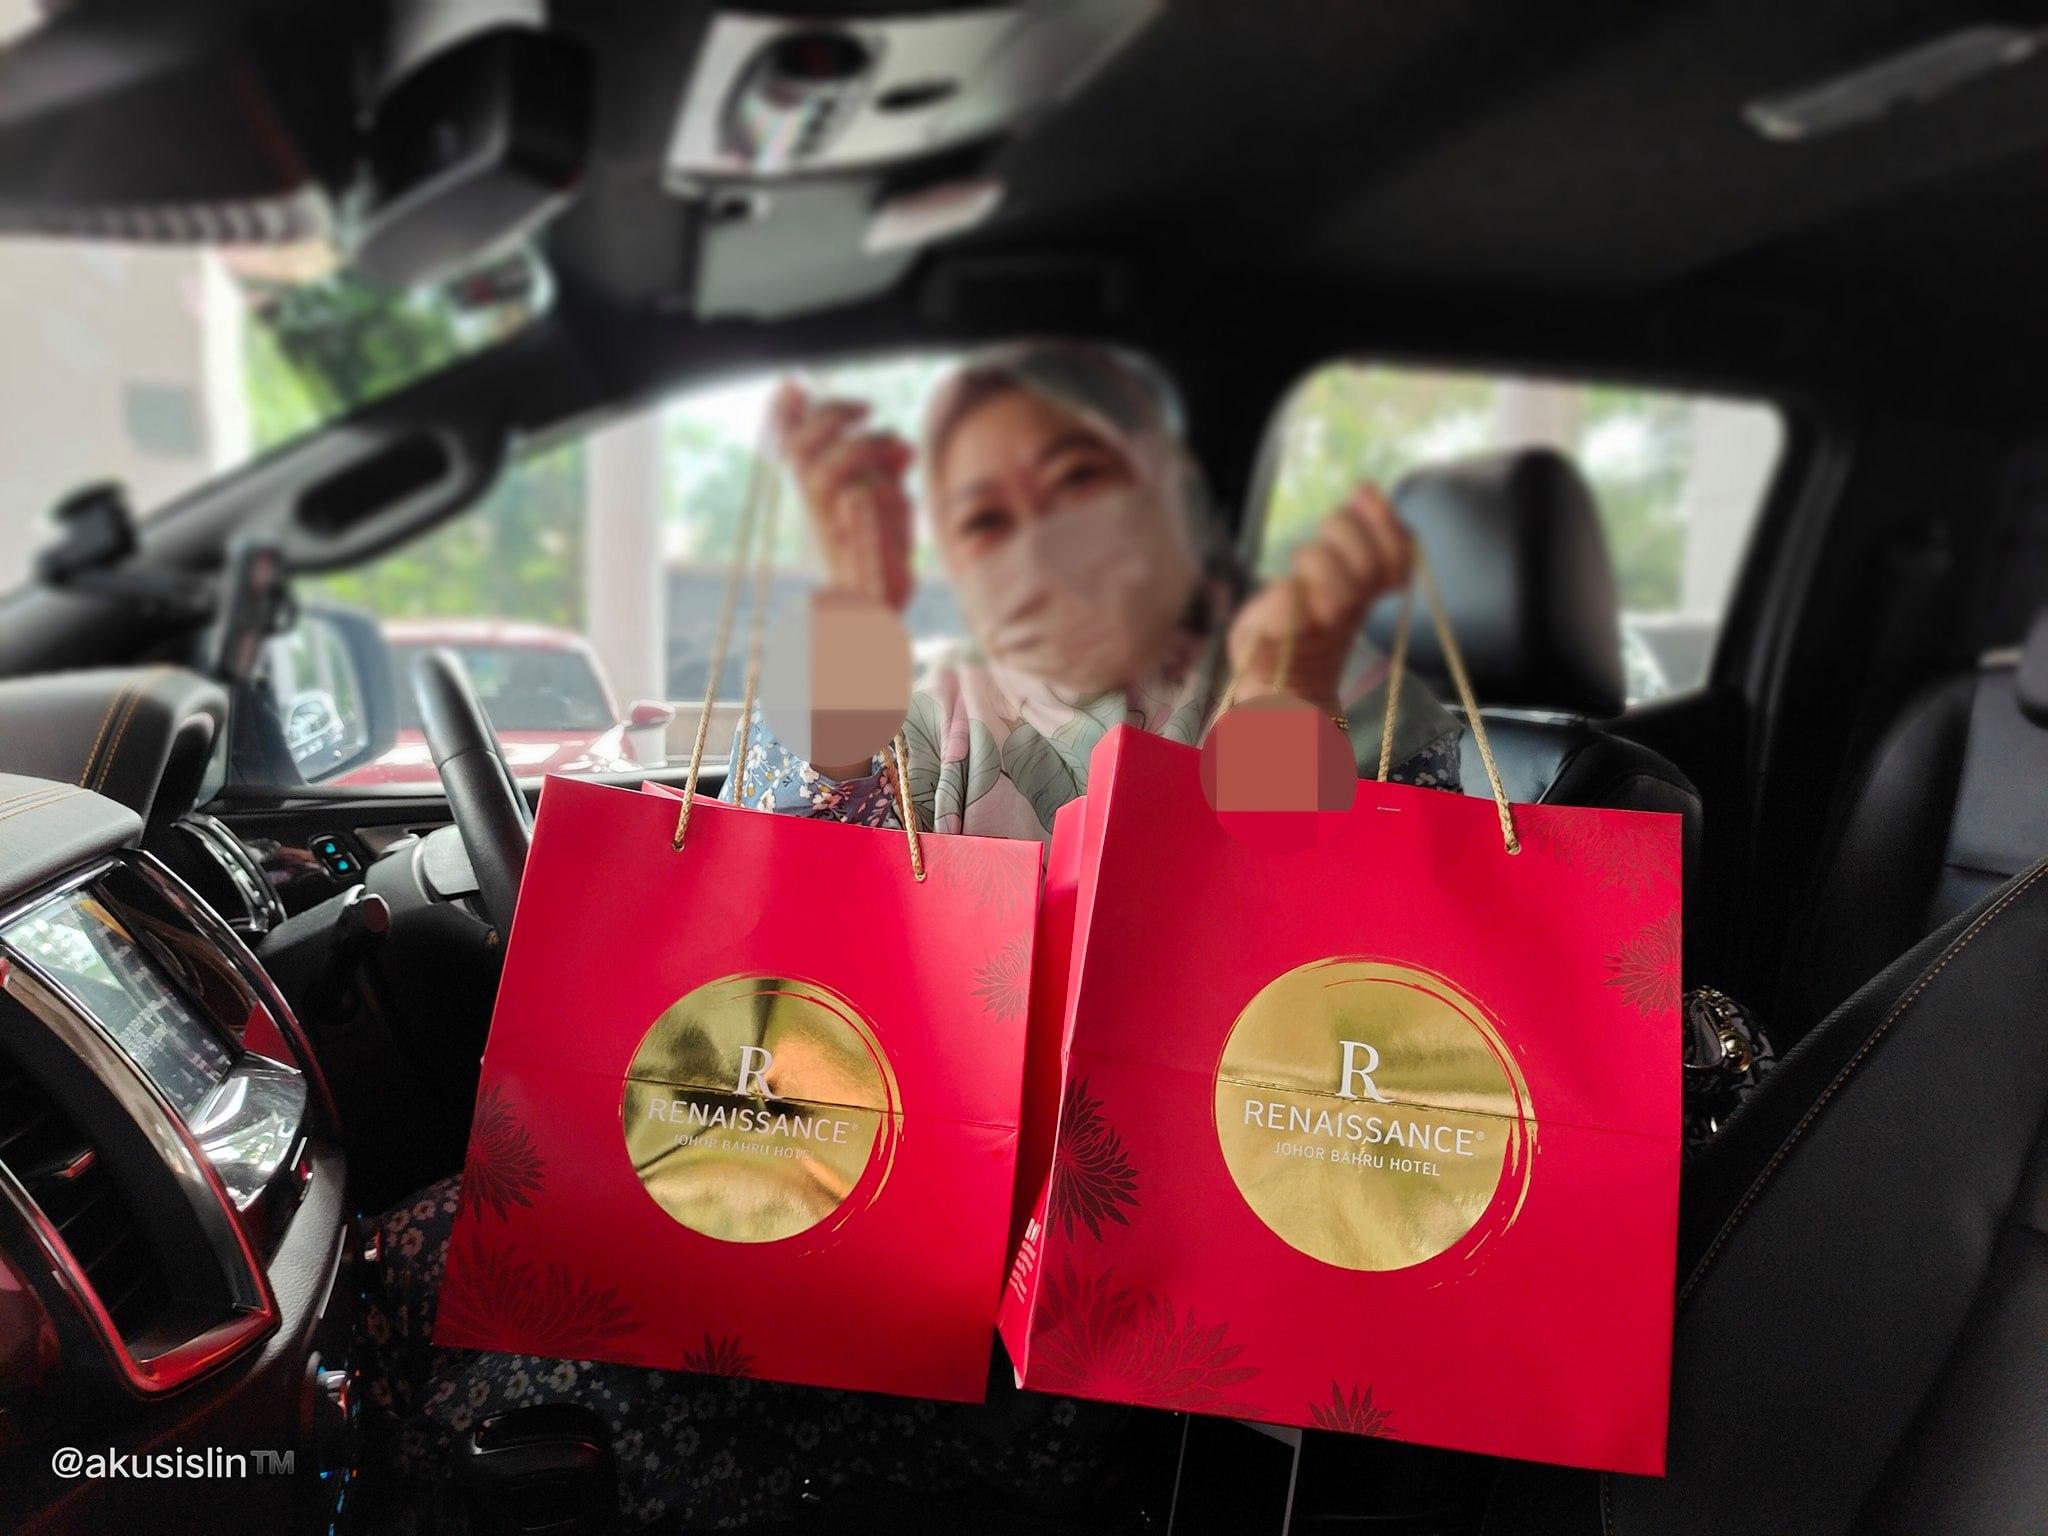 Hari Kedua Puluh Lima Berbuka Puasa Aku Takeaway Nasi Biryani Renaissance Johor bahru Hotel